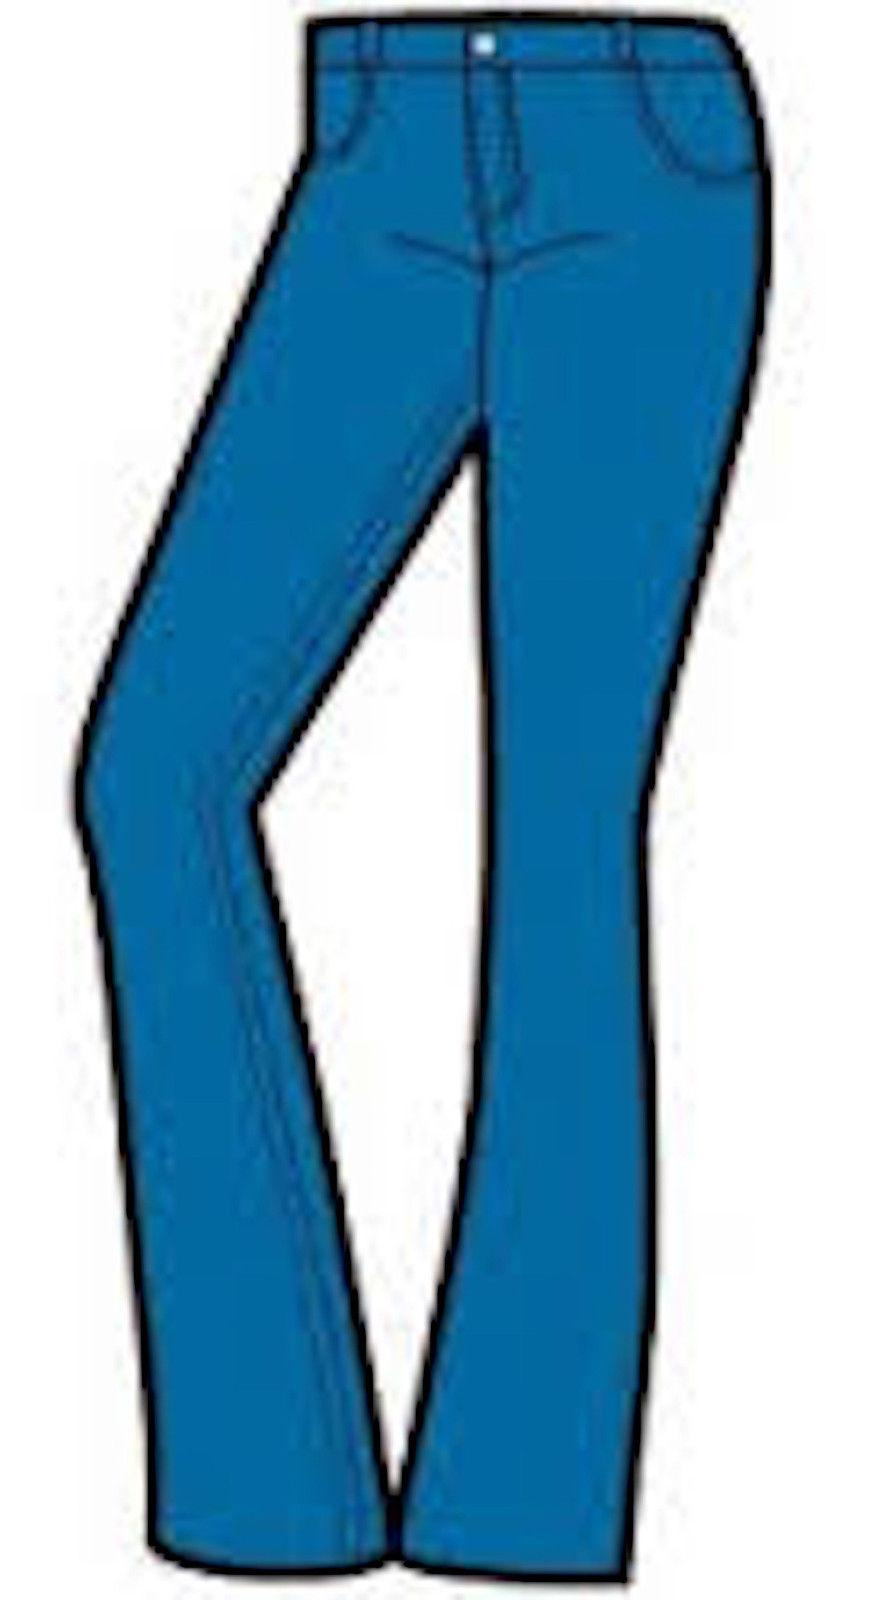 Jeans clipart denim. Free download best